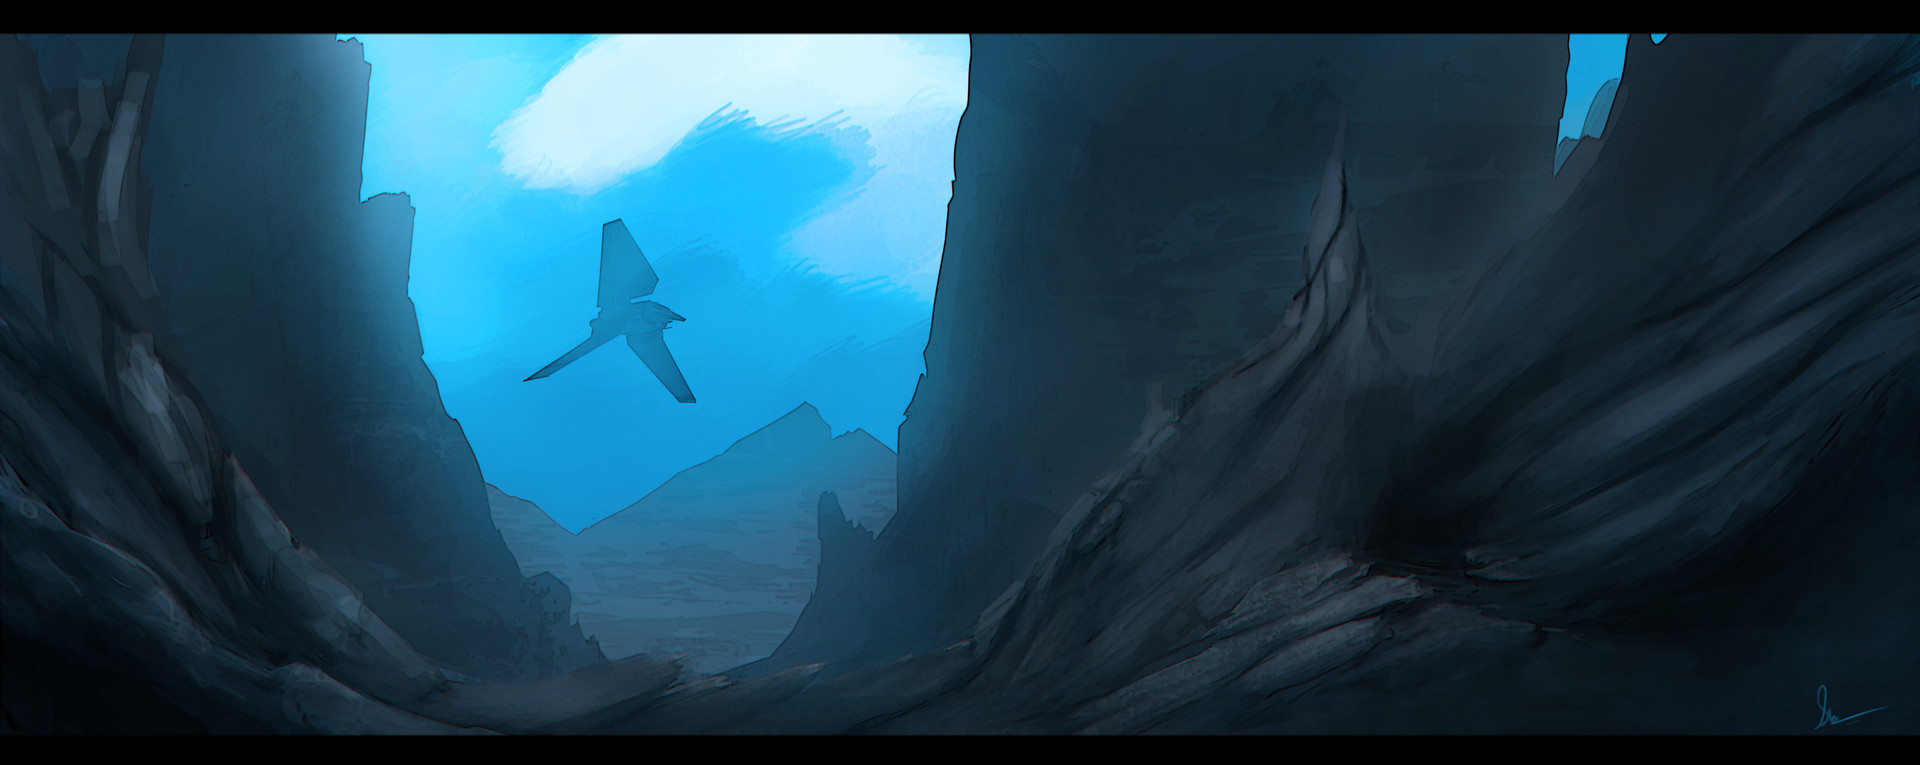 Shwetank shukla painting blue env